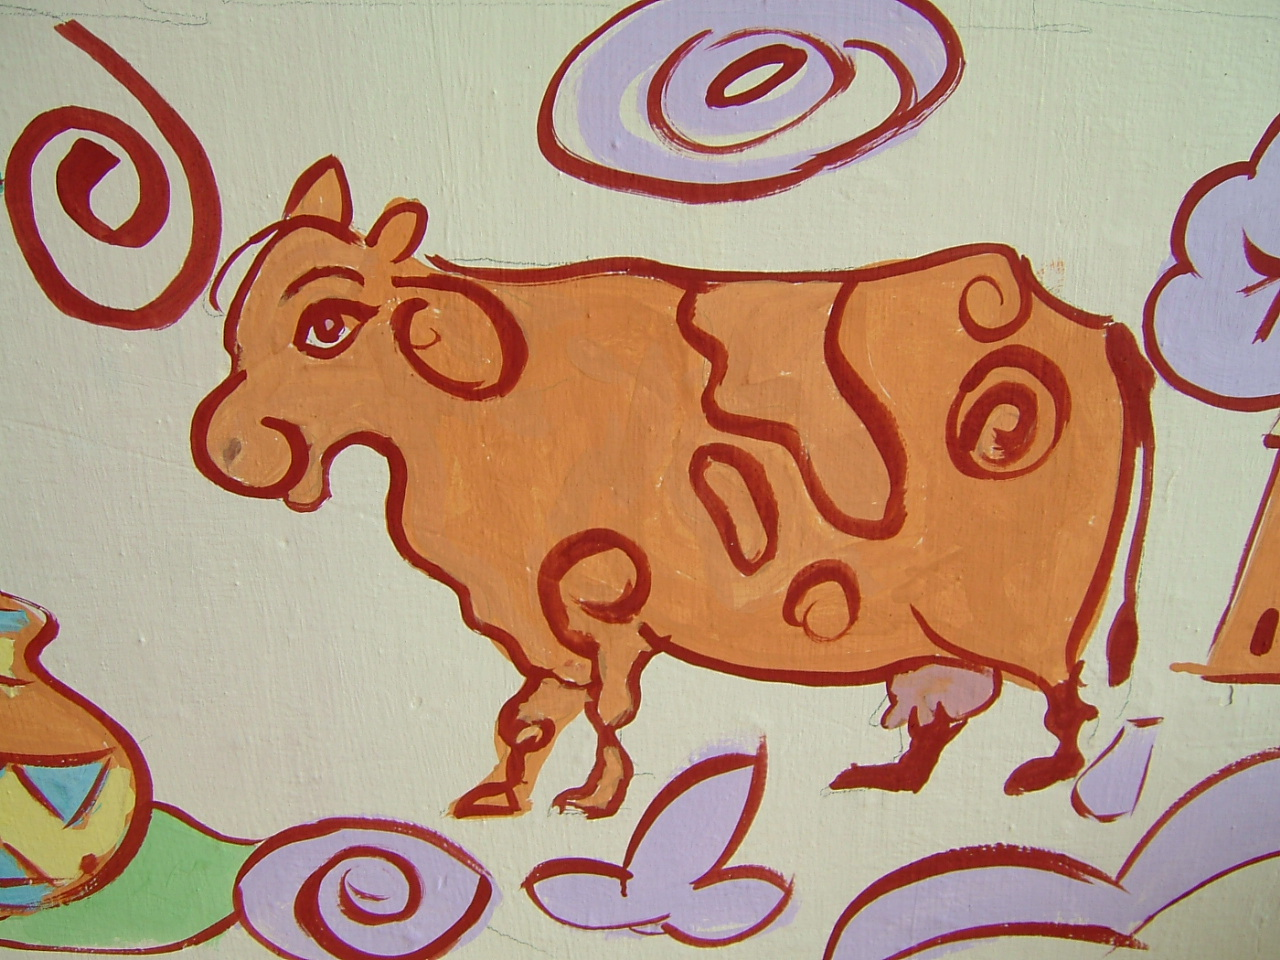 Groovy cow